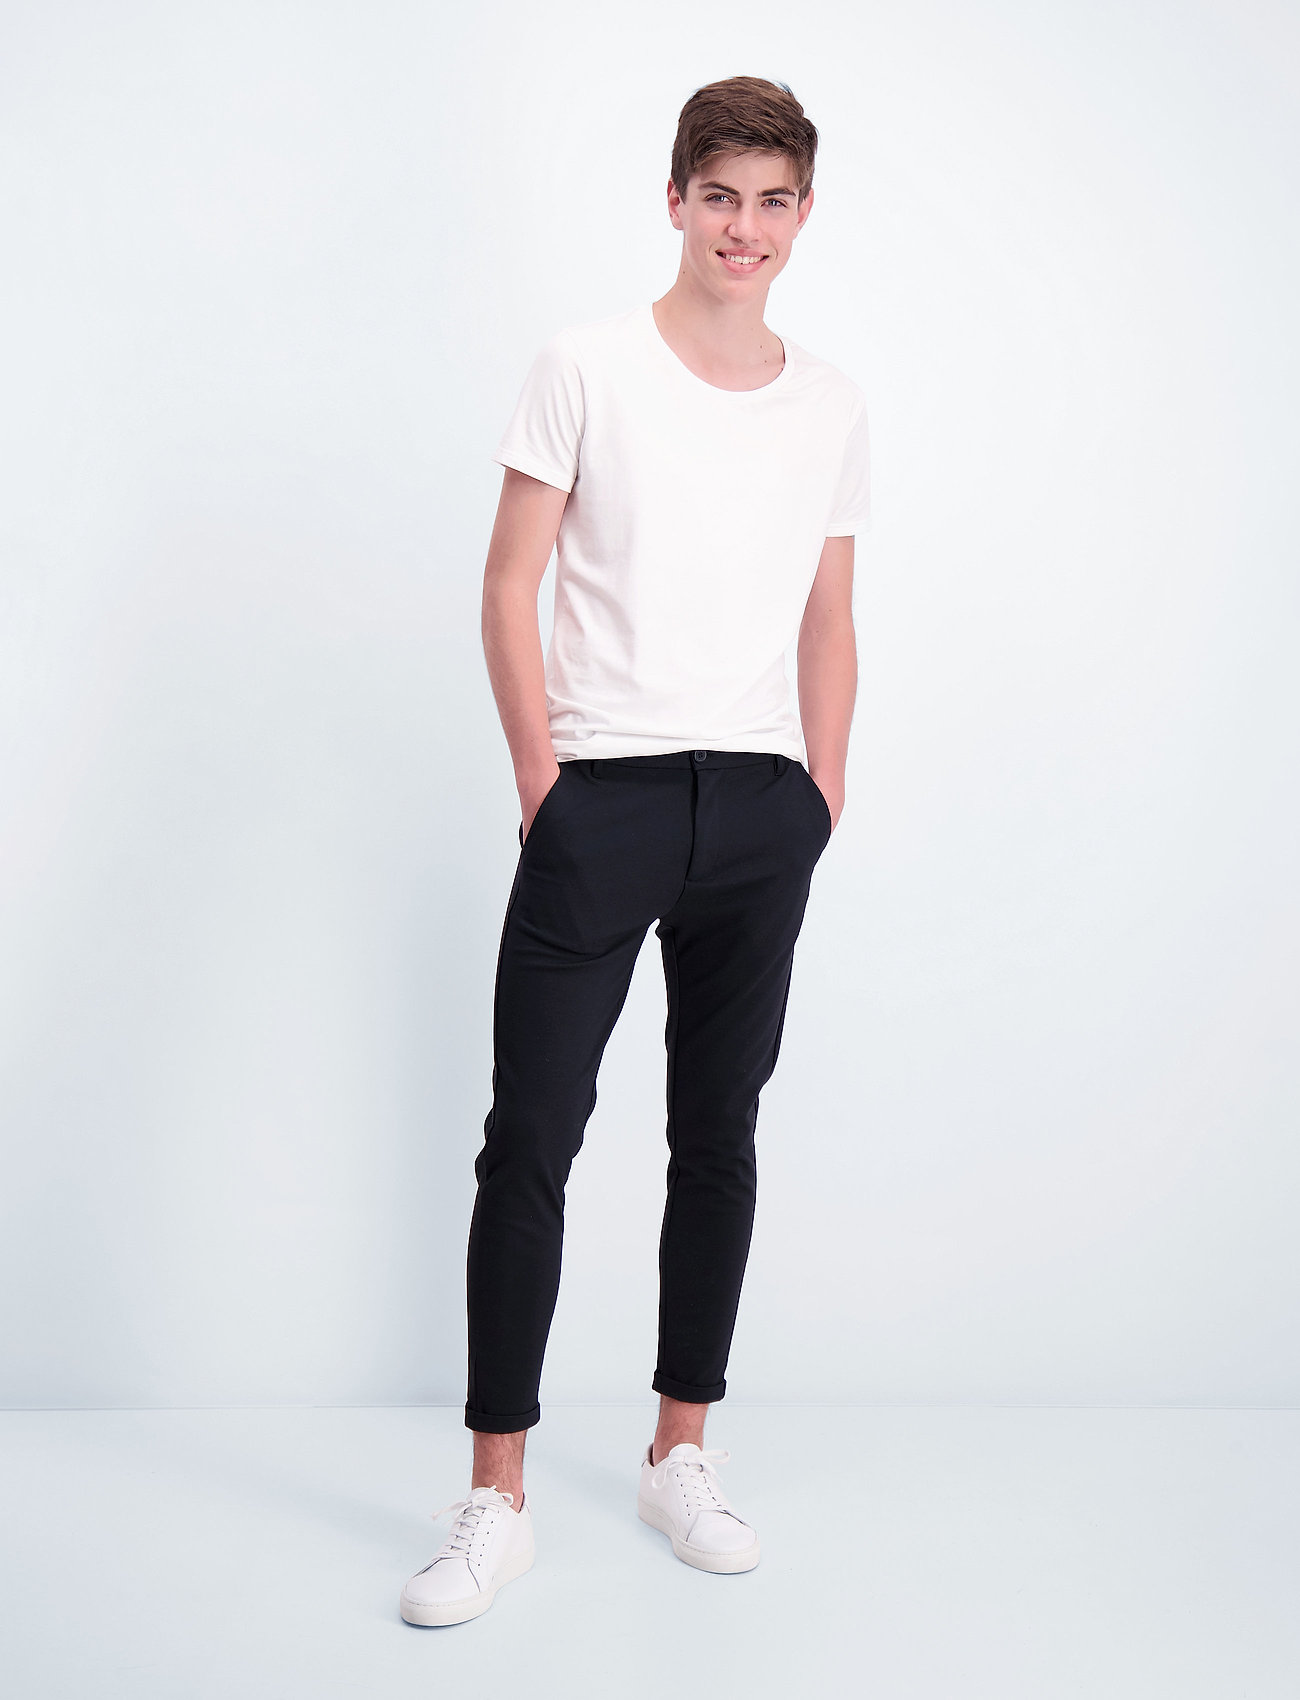 Lindbergh - Superflex knitted cropped pant - puvunhousut - black - 0